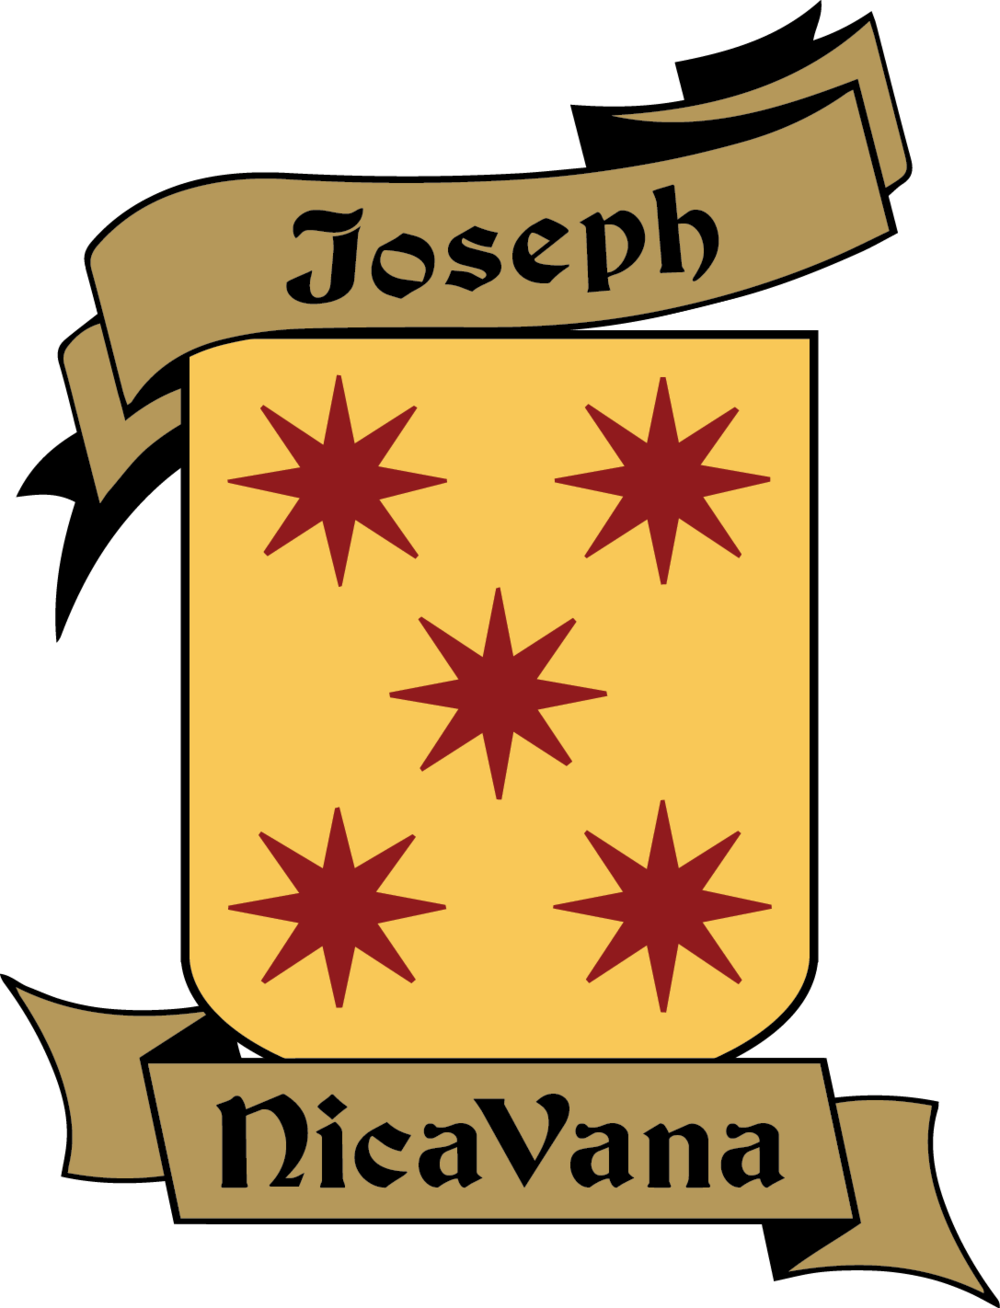 Joseph_NicaVana_crest.png